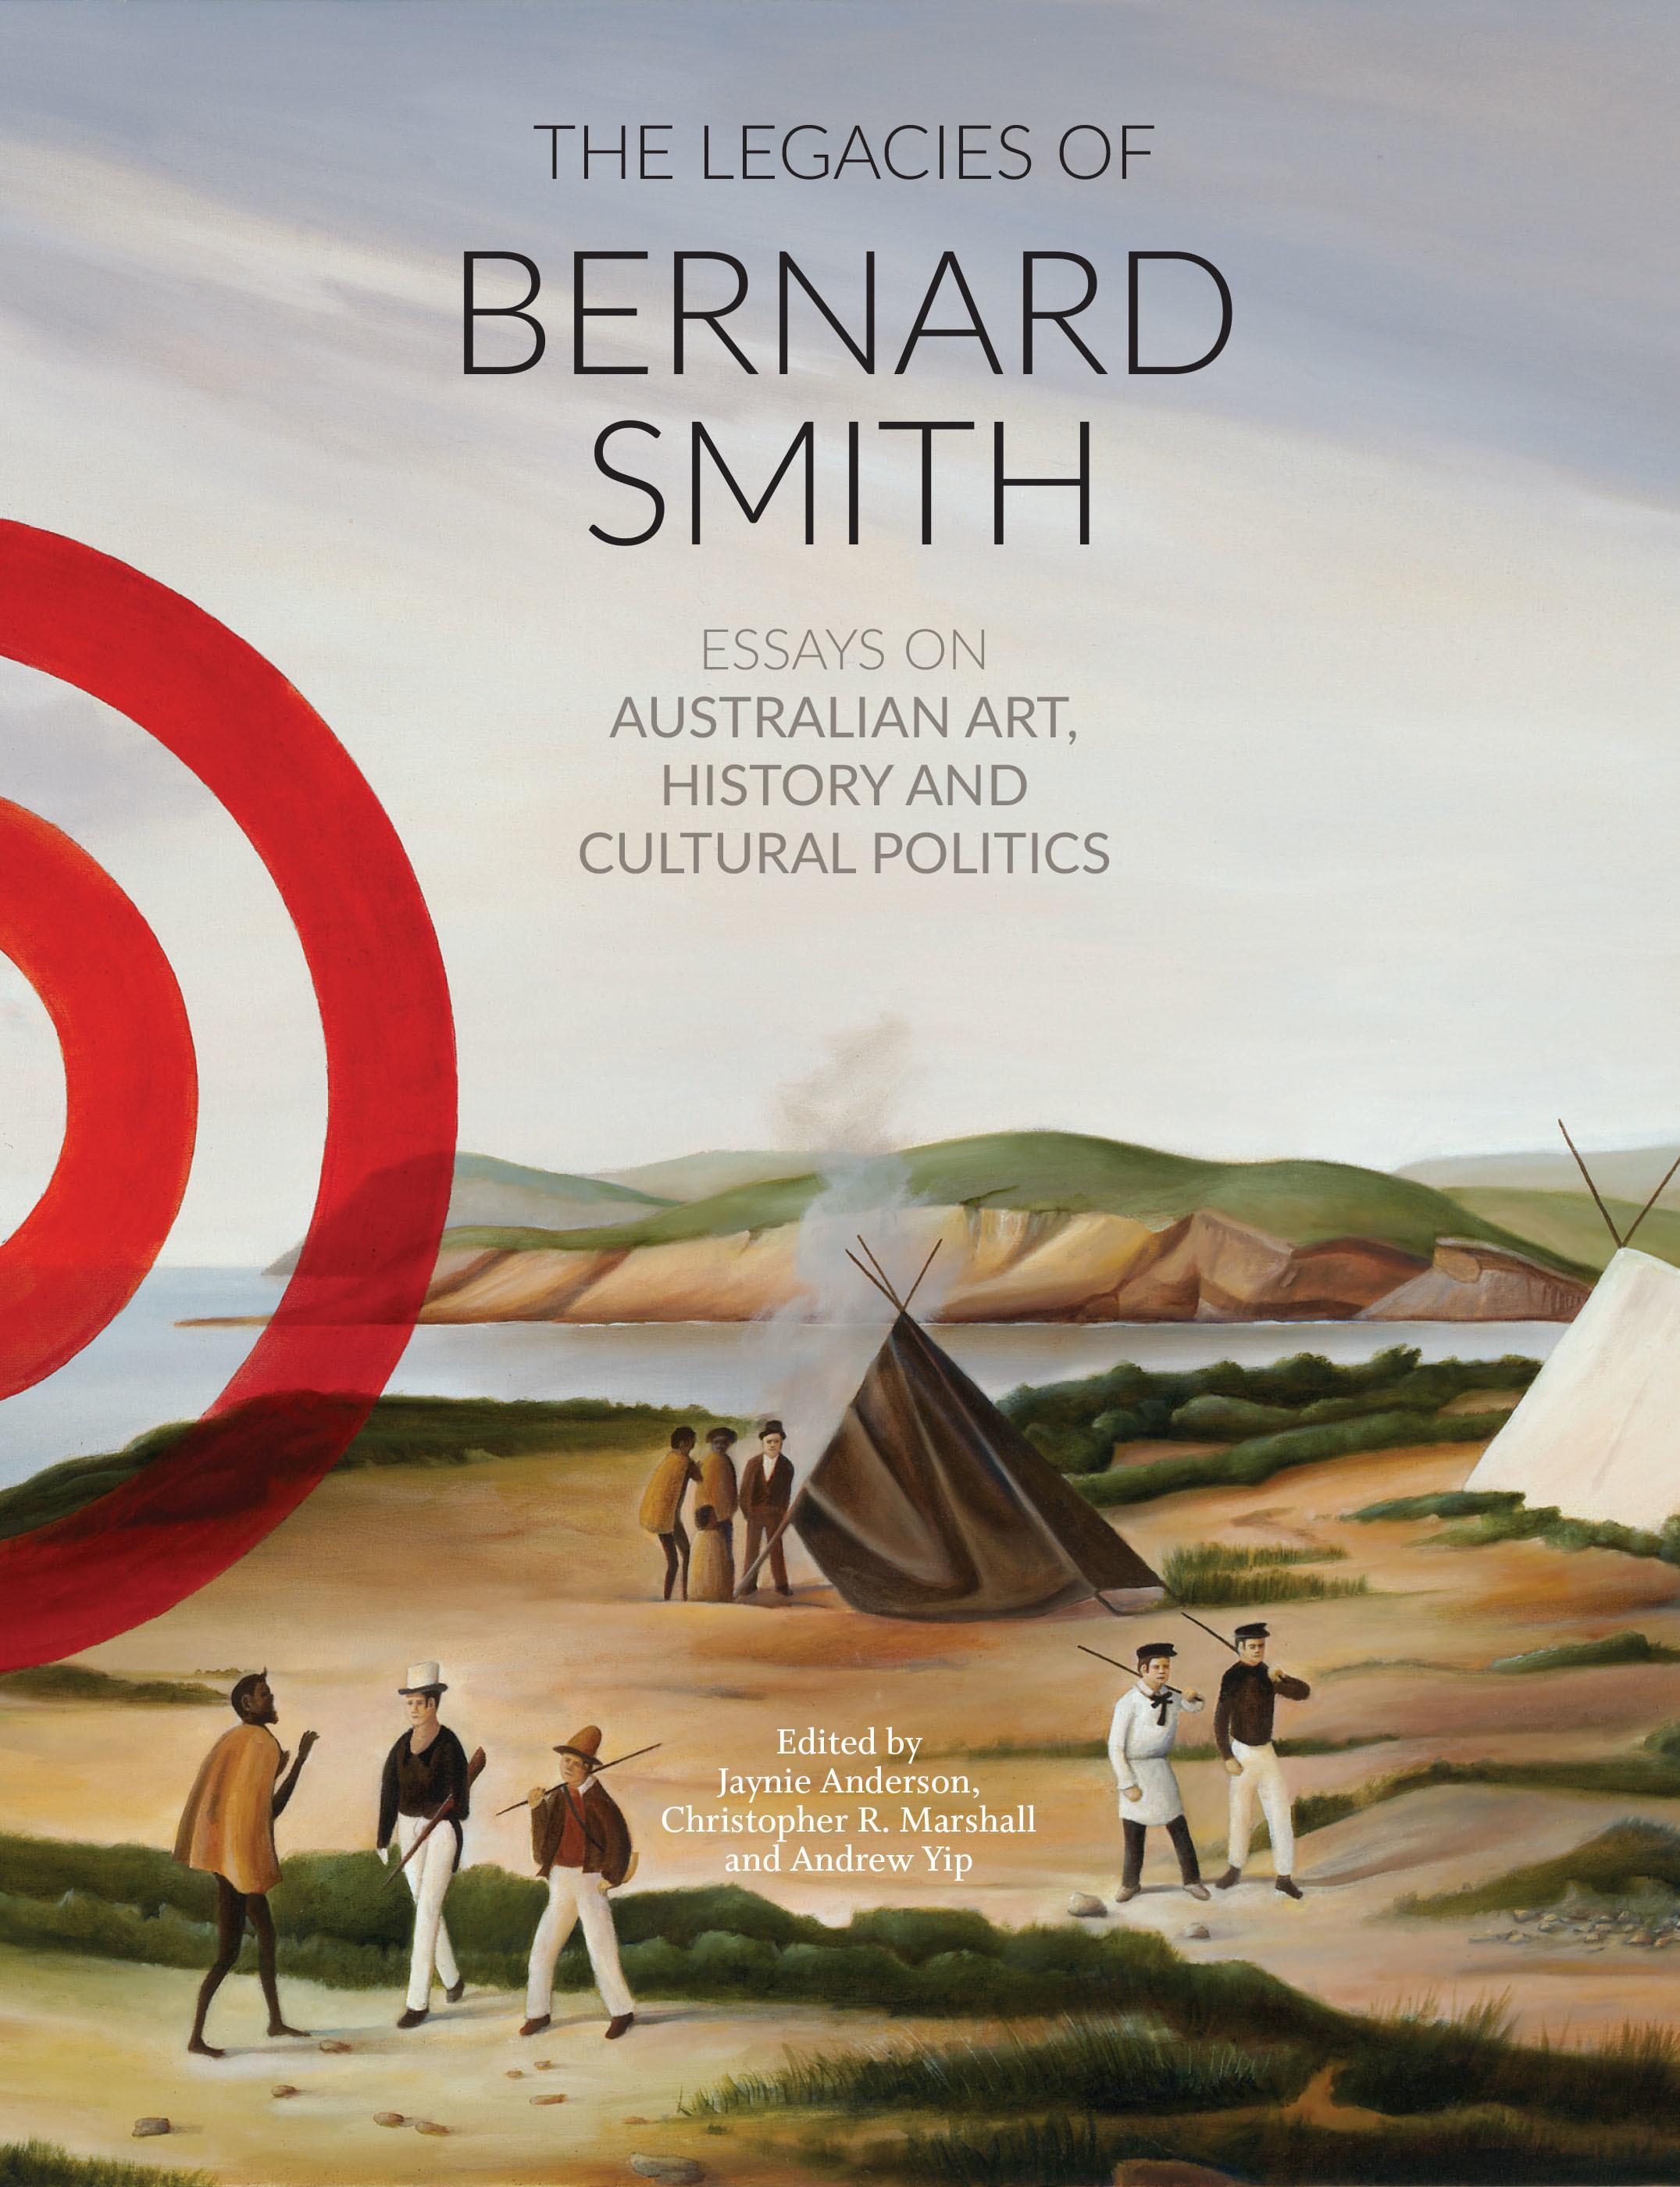 The Legacies Of Bernard Smith: Essays on Australian Art, History and Cultural Politics